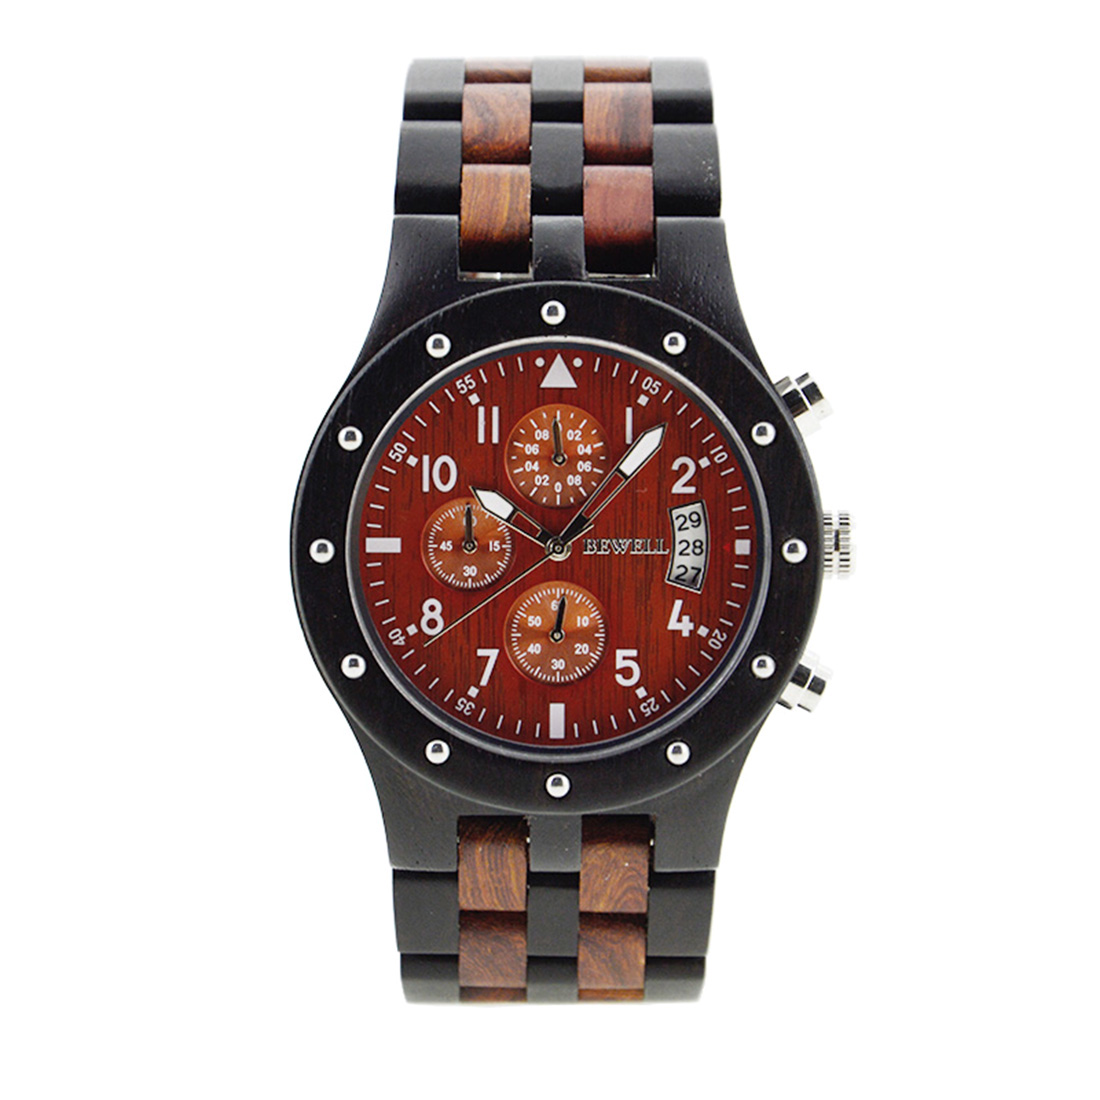 Black Men Wrist Watch Sandalwood Quartz Wood Watches Luxury Business Formal Date Display Clock New Fashion Relogios Masculinos